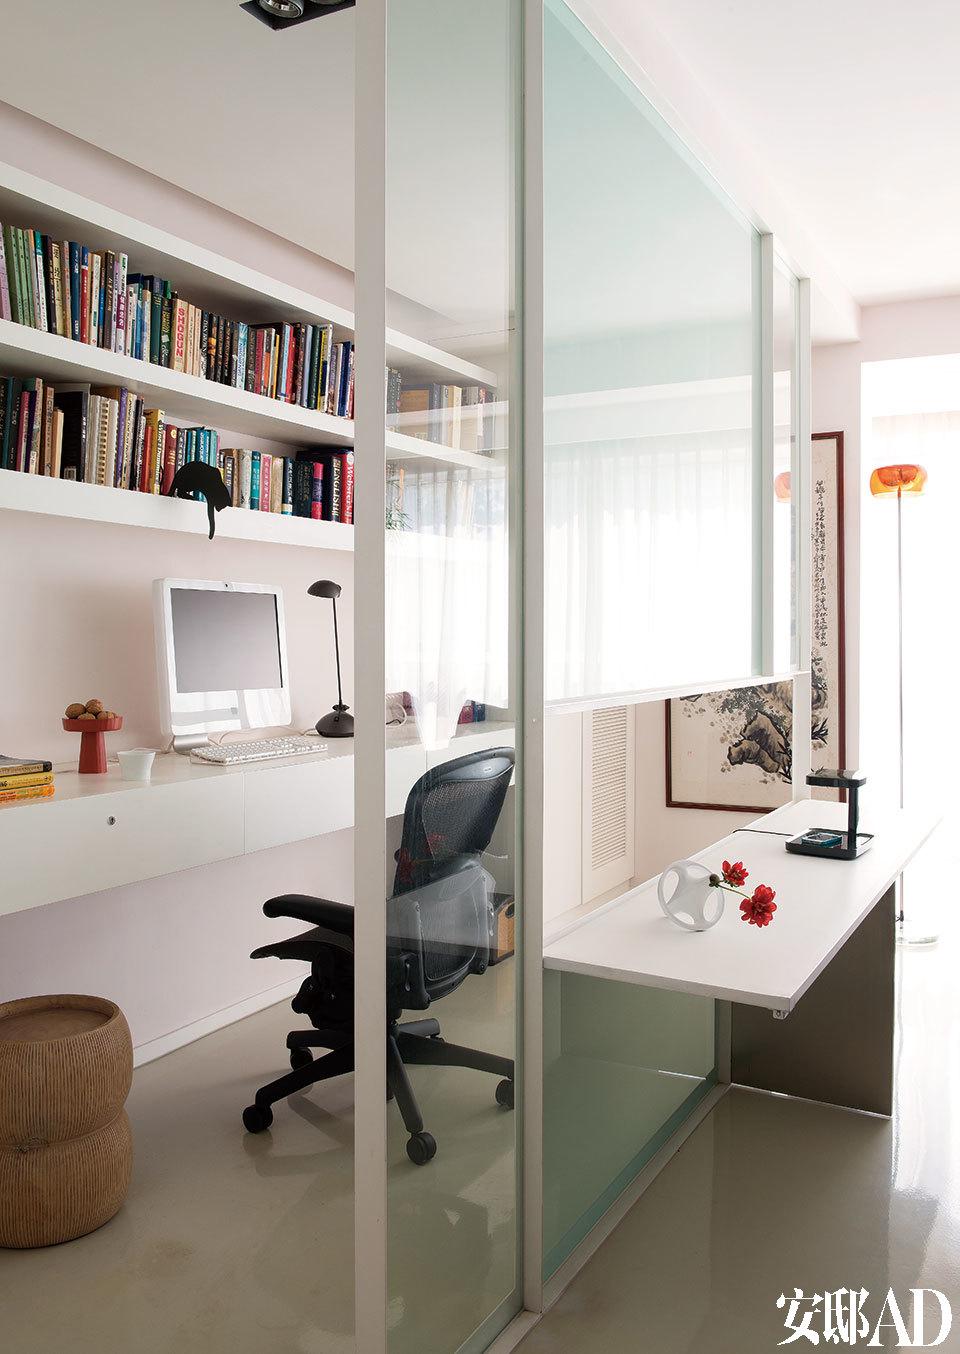 "Frank设计的钢架玻璃隔断中央,金属板可以放平成为一张临时的桌面。桌面上的白色花瓶为Bosa,黑色台灯为Flos品牌,均来自北京""家天地""。书 房中的座椅为Herman Miller品牌,小凳来自香港的OVO Home,书架上黑色的猫咪书挡同样是主人在新加坡旅行时的战利品。"